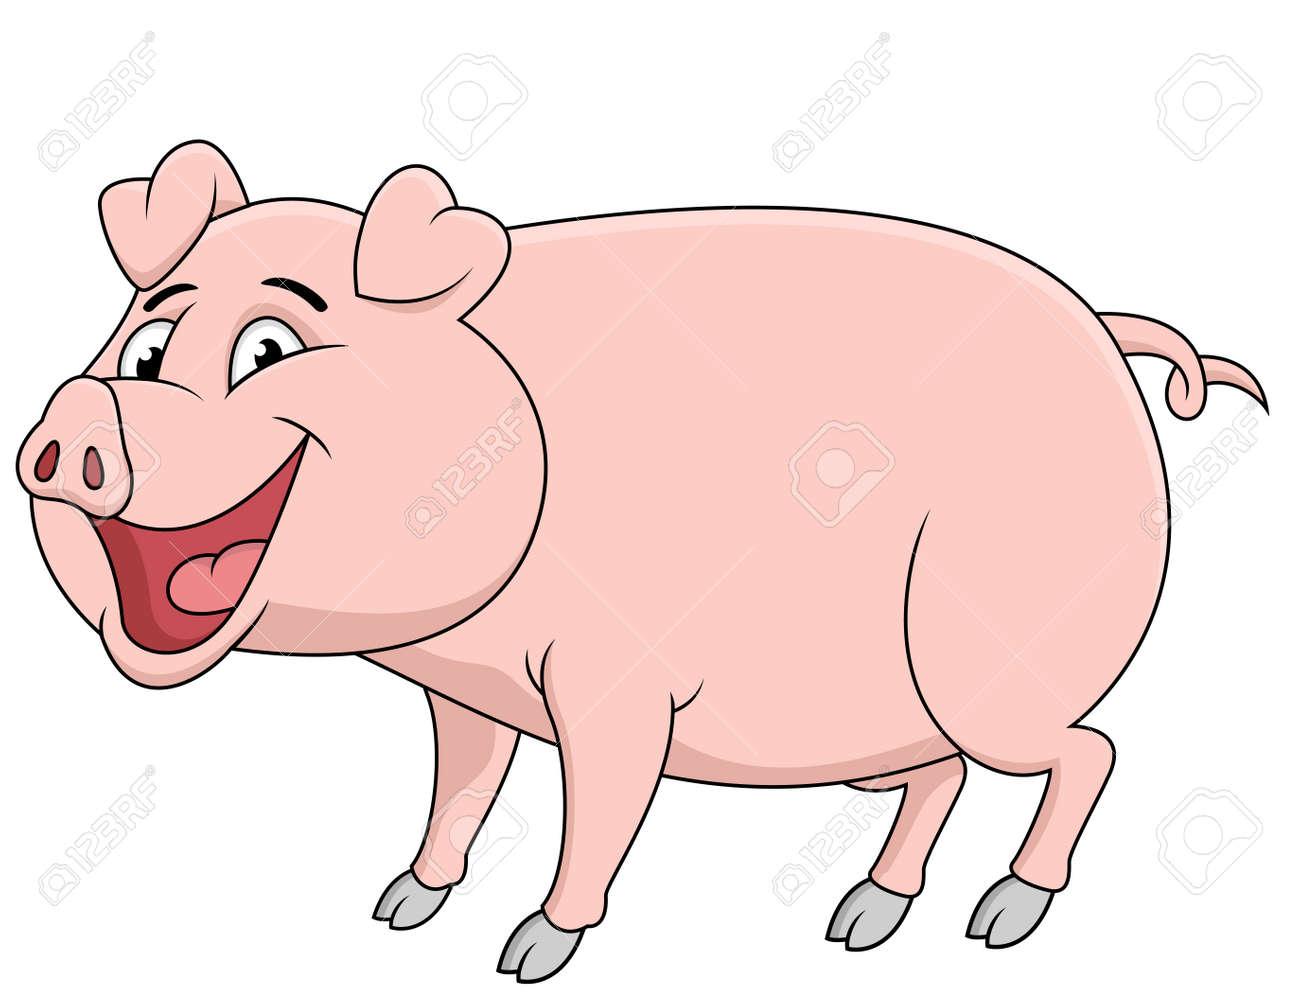 Pig cartoon Stock Vector - 13393573